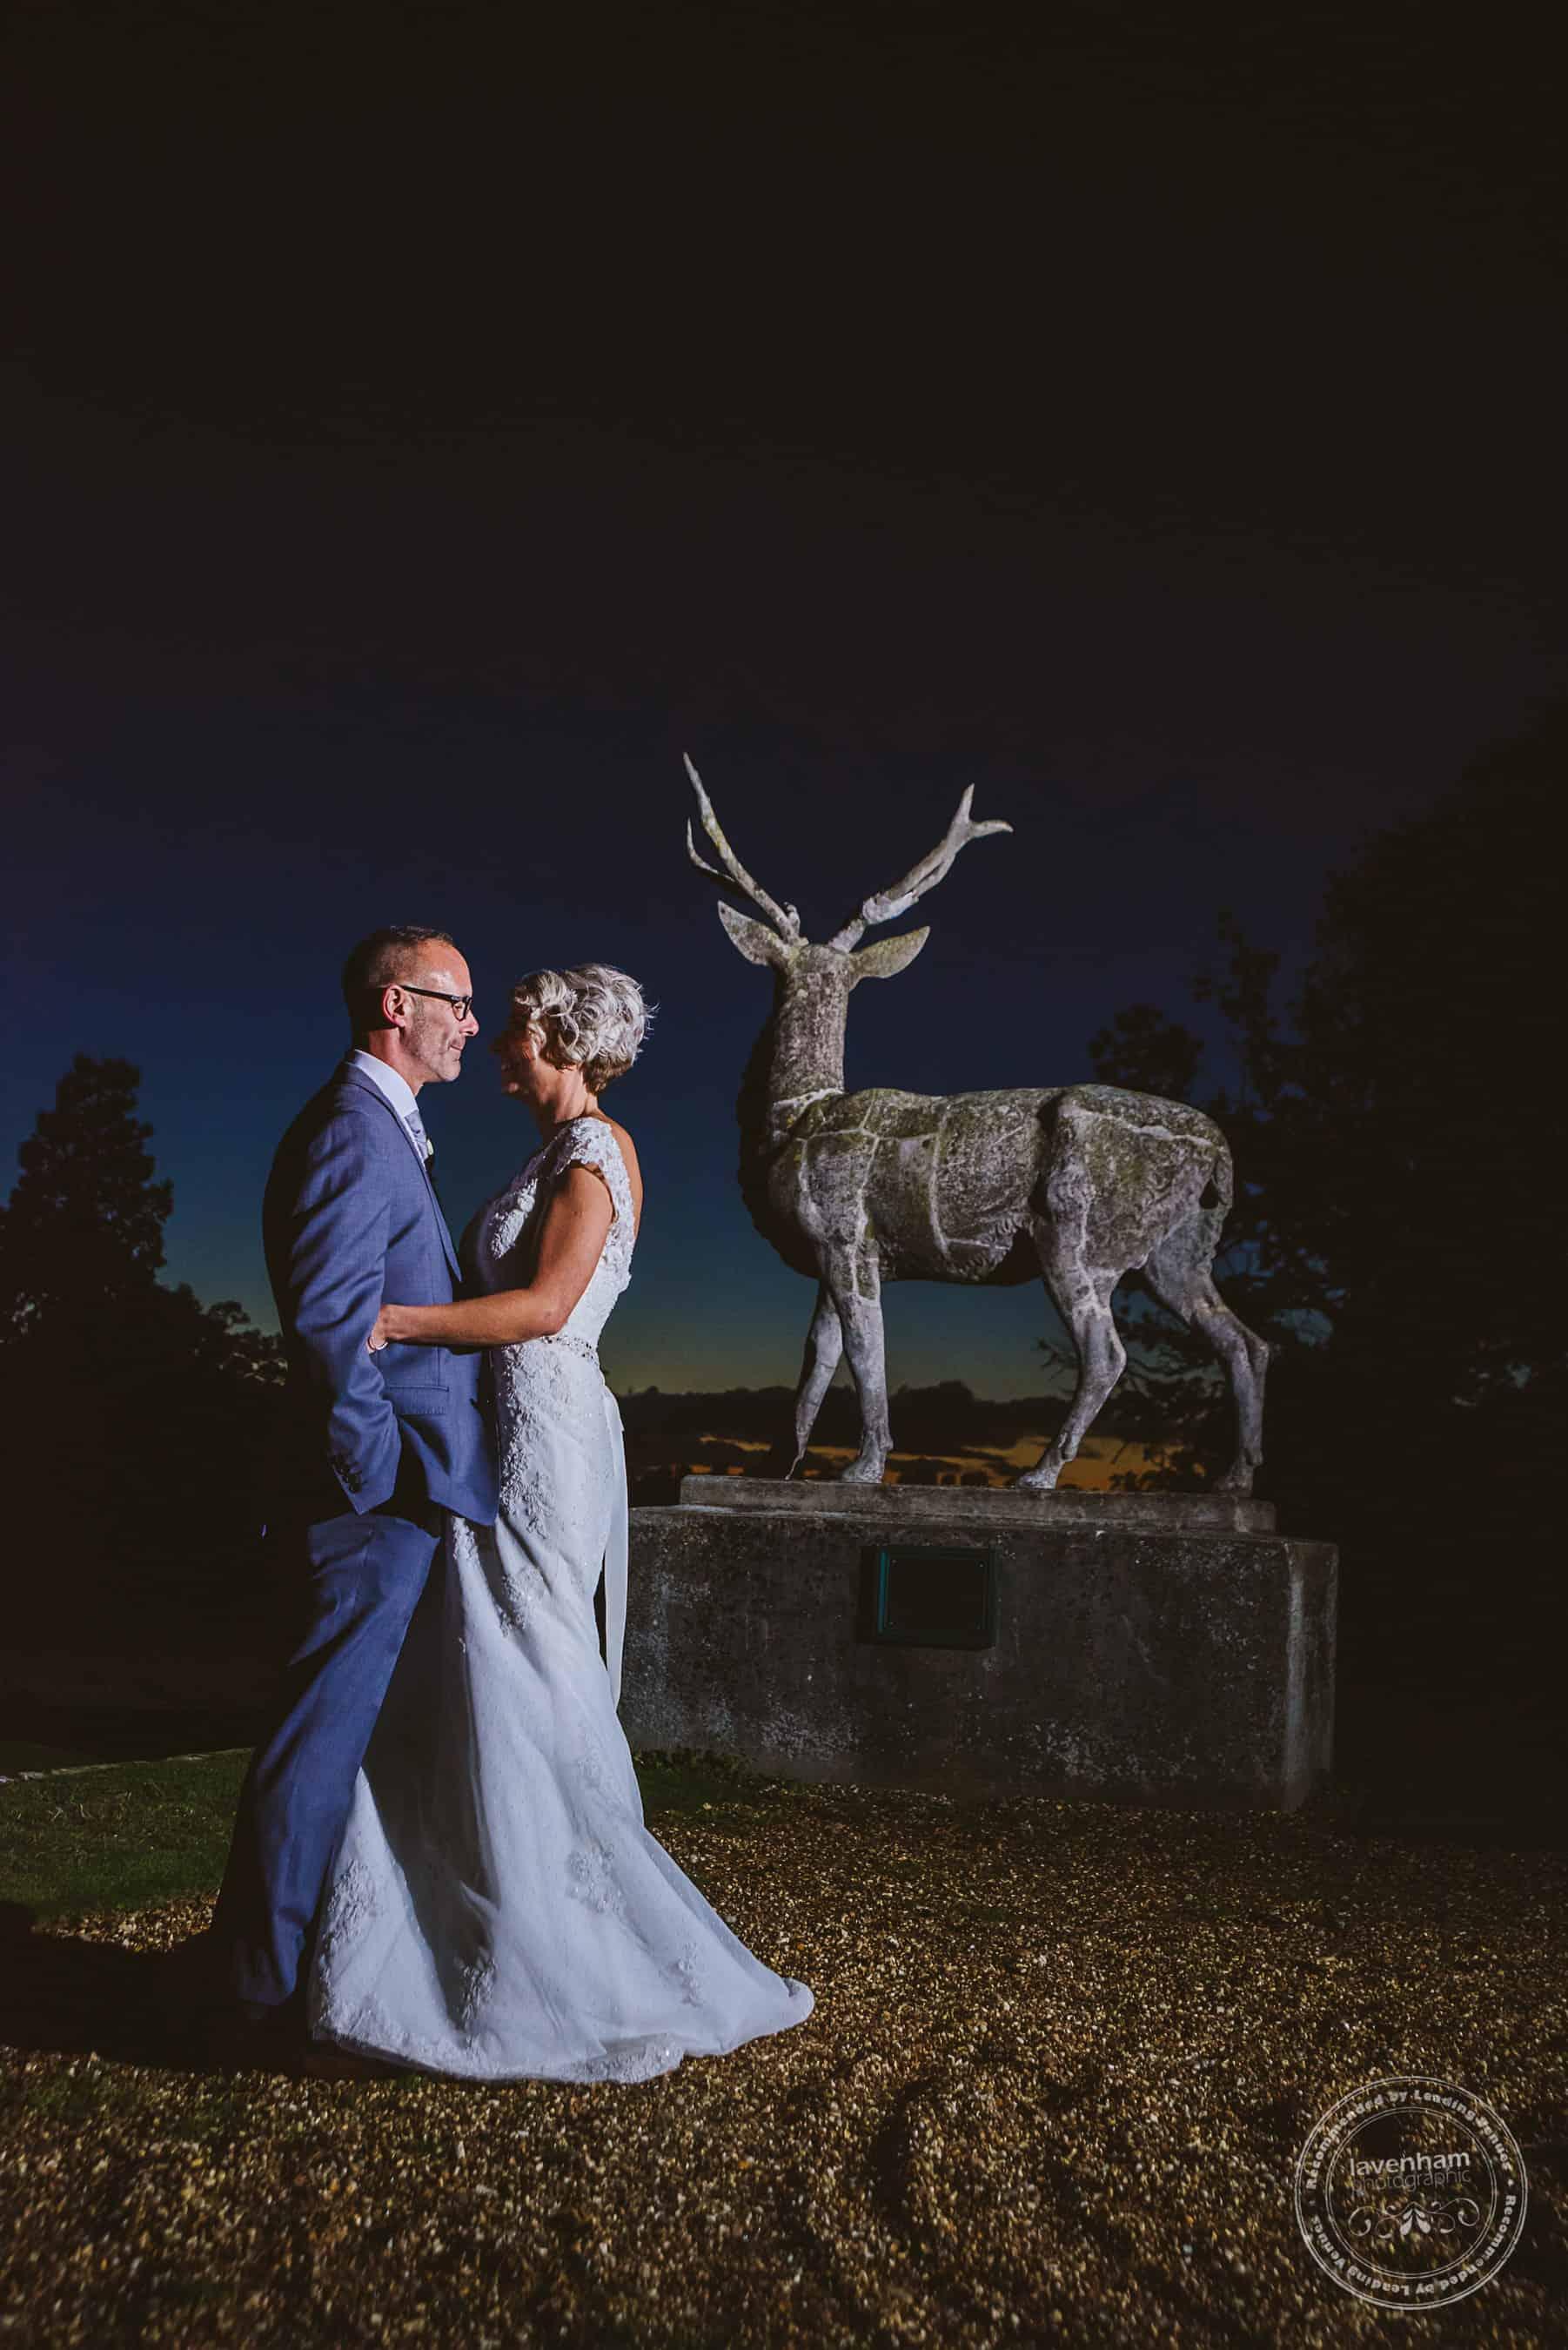 281018 Gosfield Hall Wedding Photography Lavenham Photographic 109